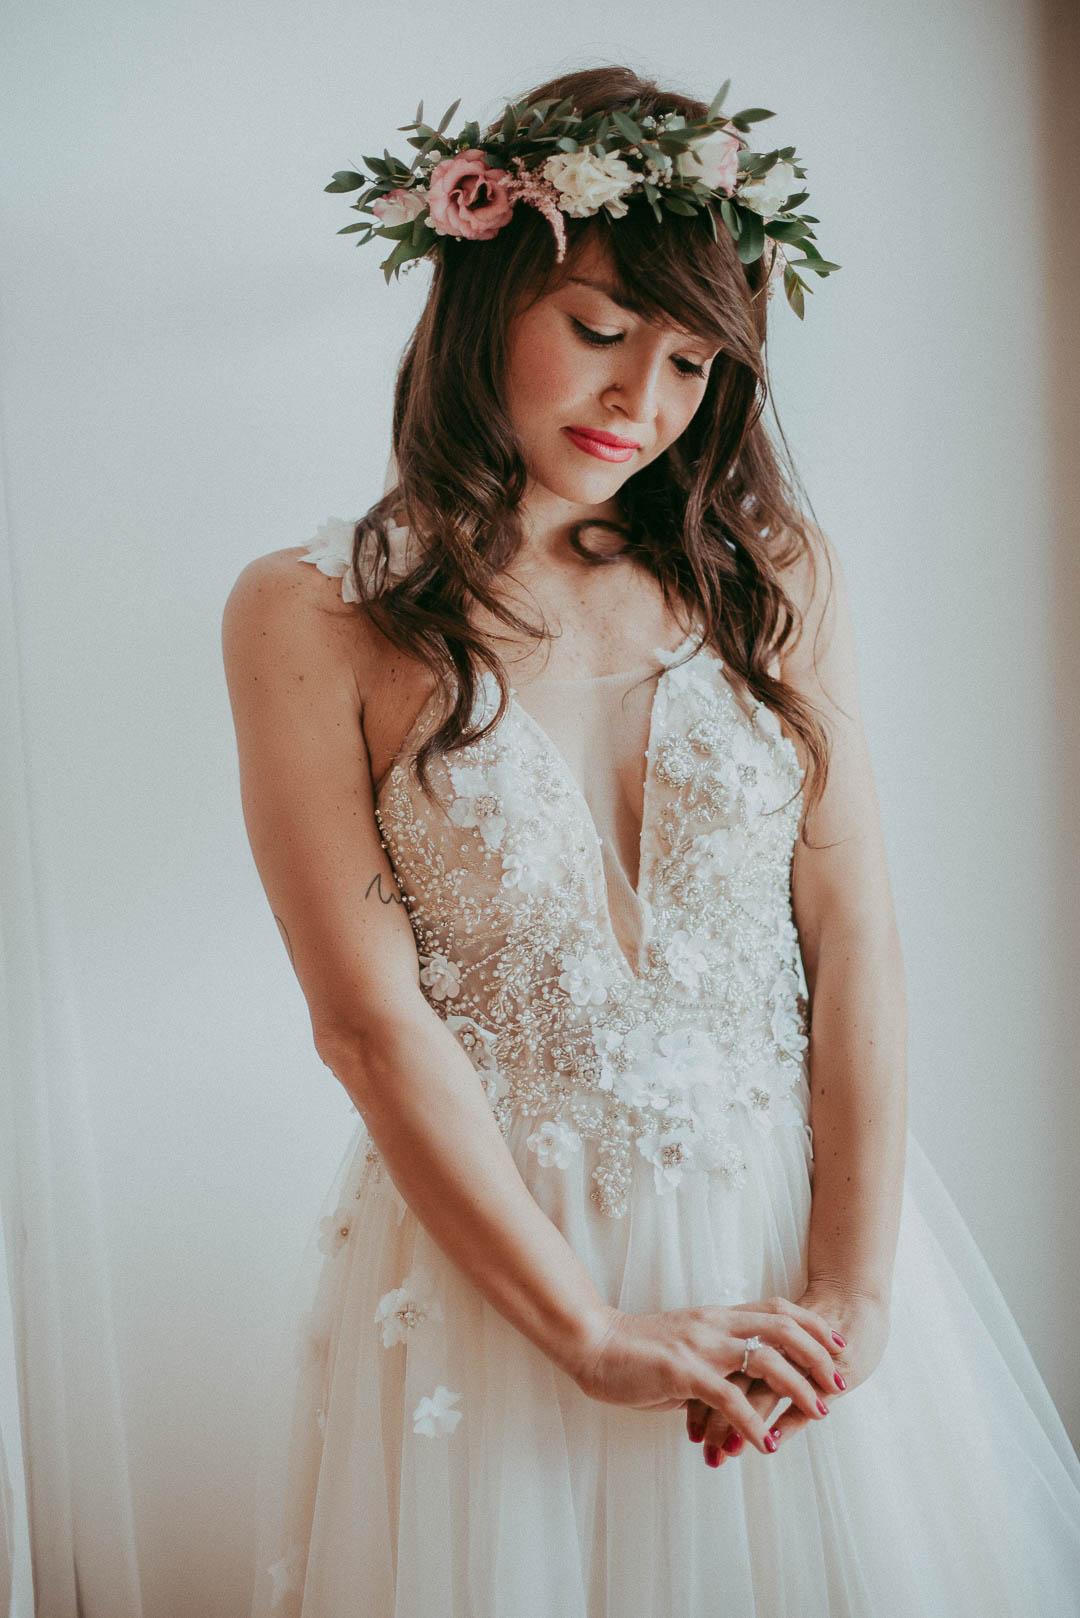 wedding-photographer-destination-fineart-bespoke-reportage-amalficoast-torrelacerniola-vivianeizzo-spazio46-46